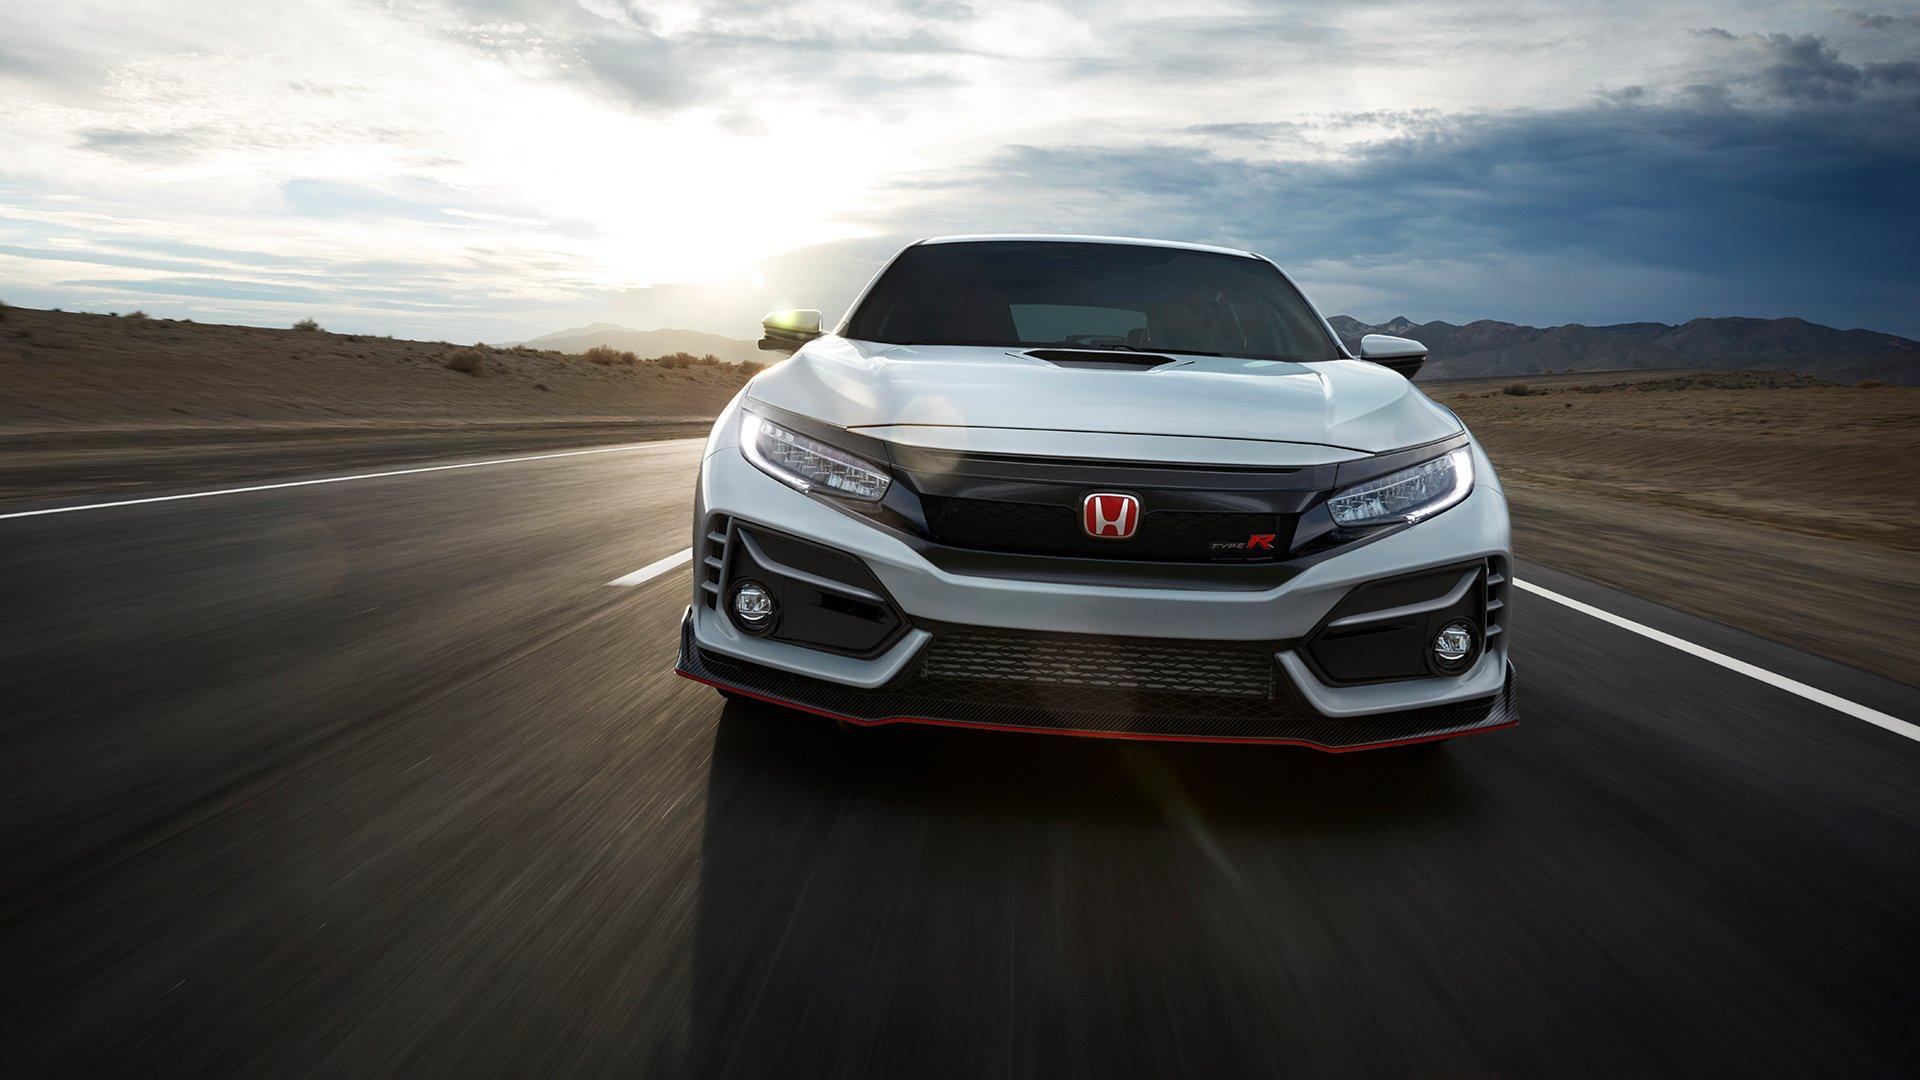 Civic Type R 2020 | Honda - Guatemala